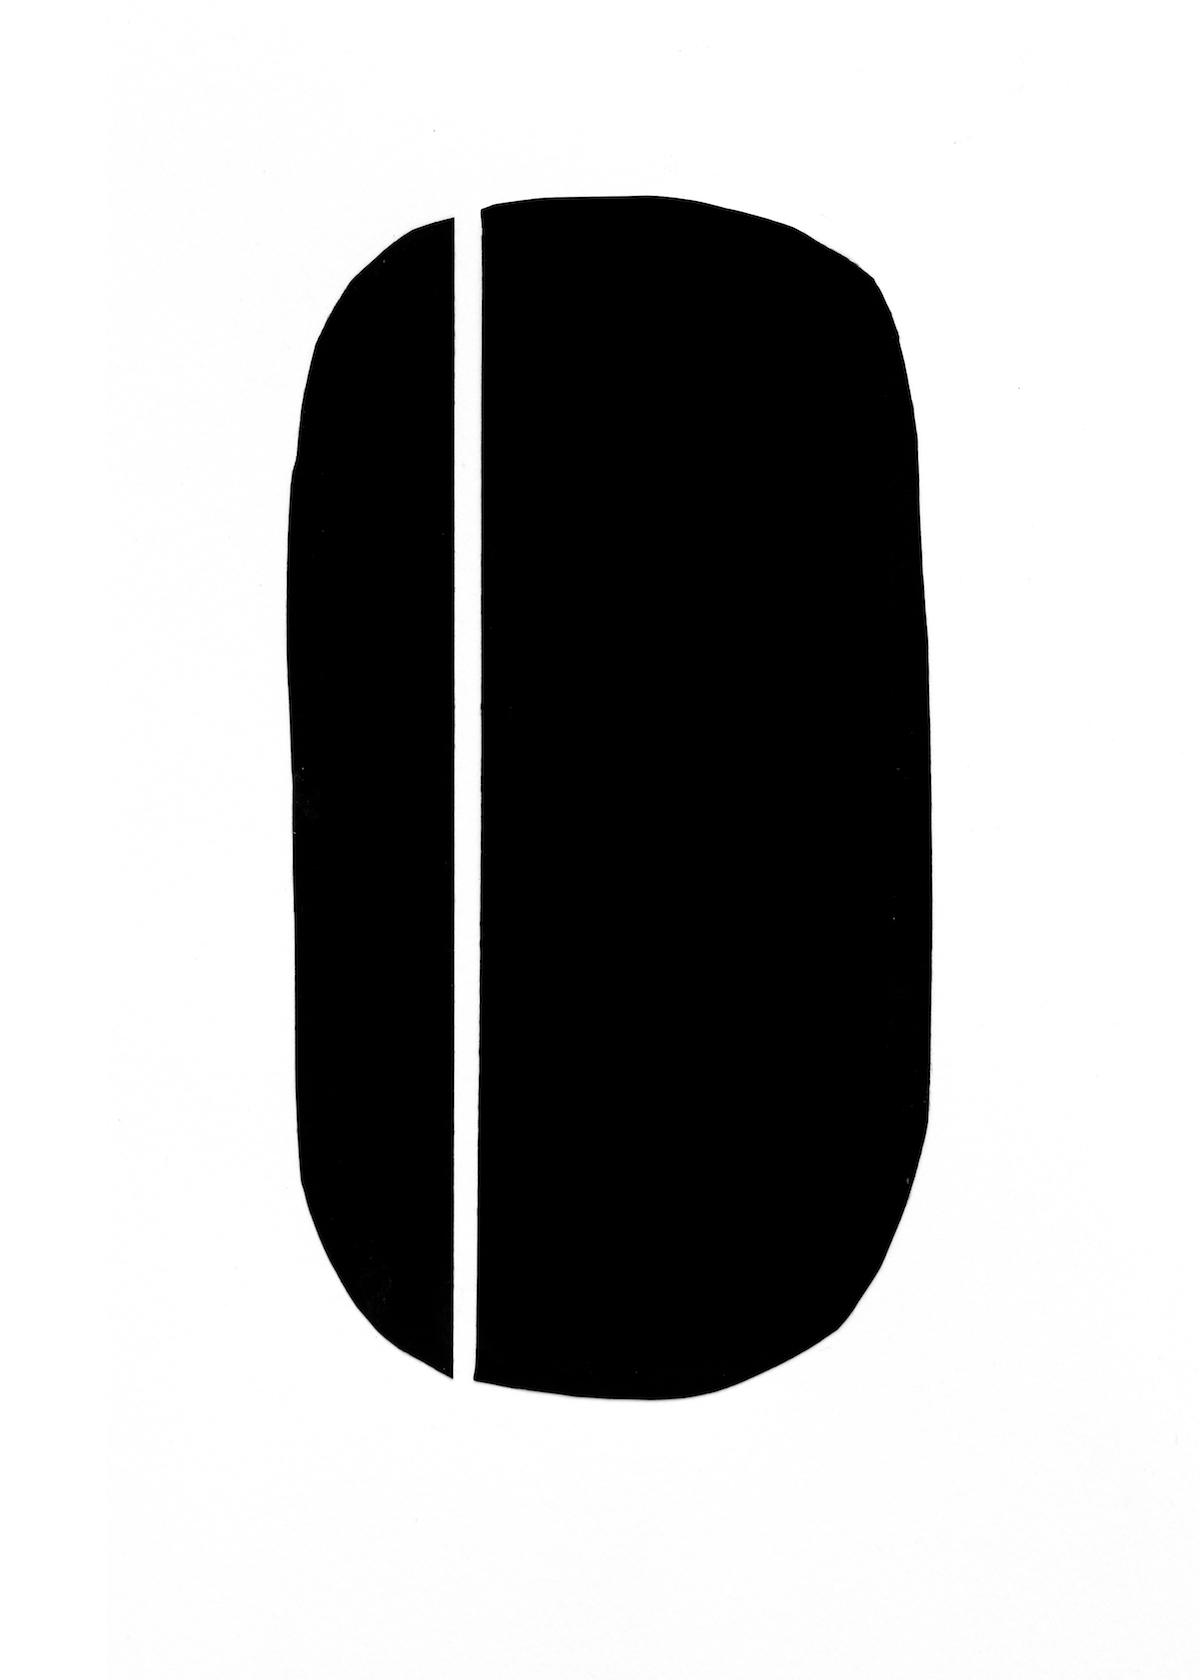 modern minimalism collage series, no. 6